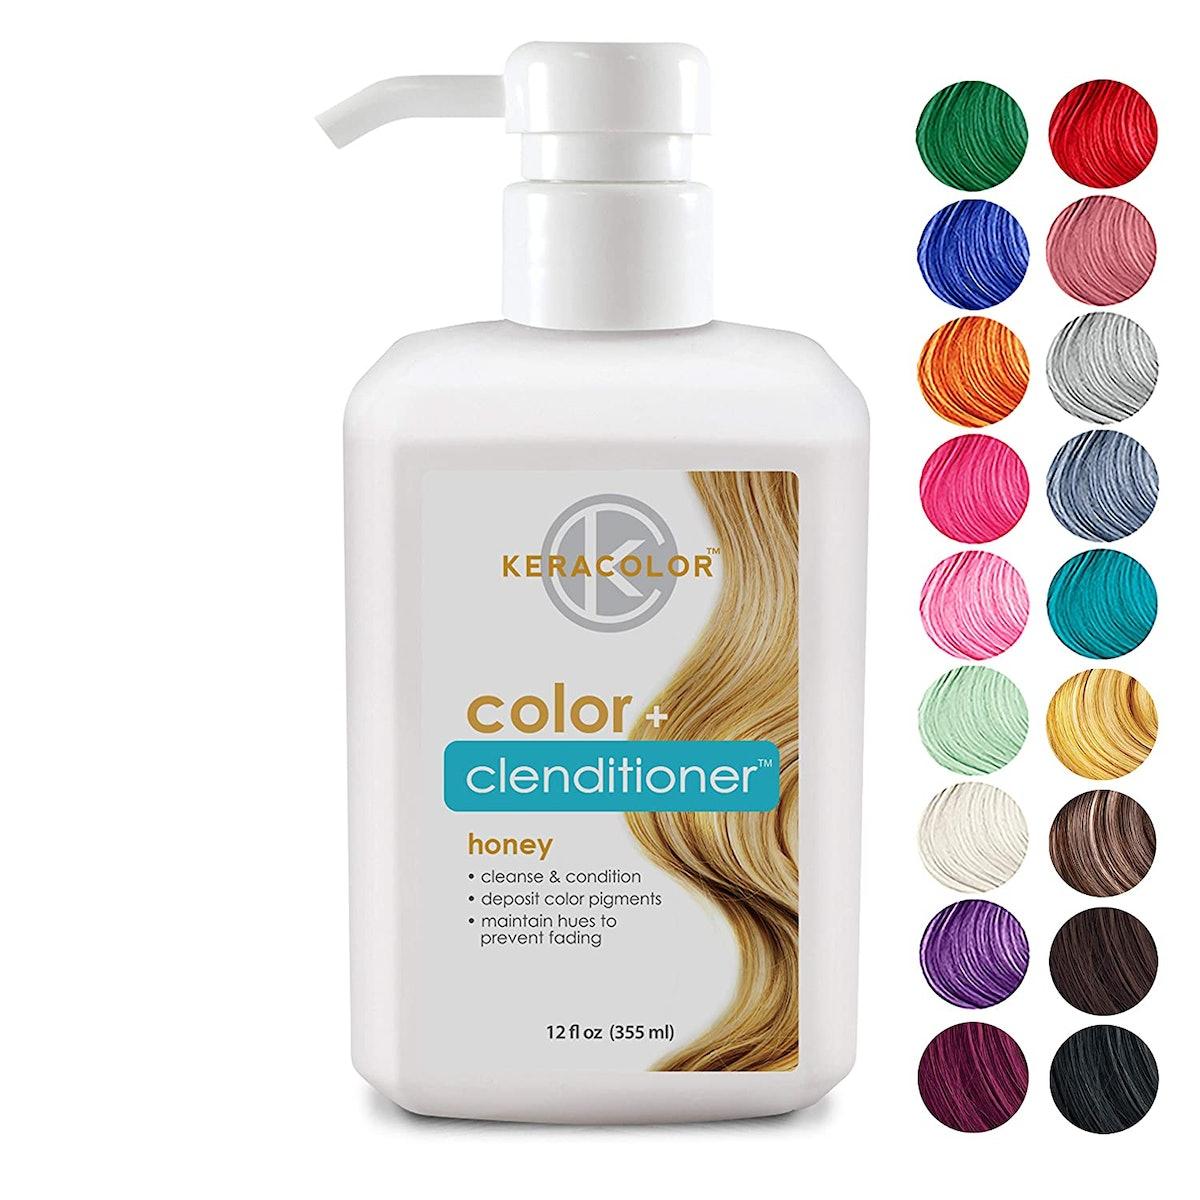 Keracolor Clenditioner Semi Permanent Hair Dye